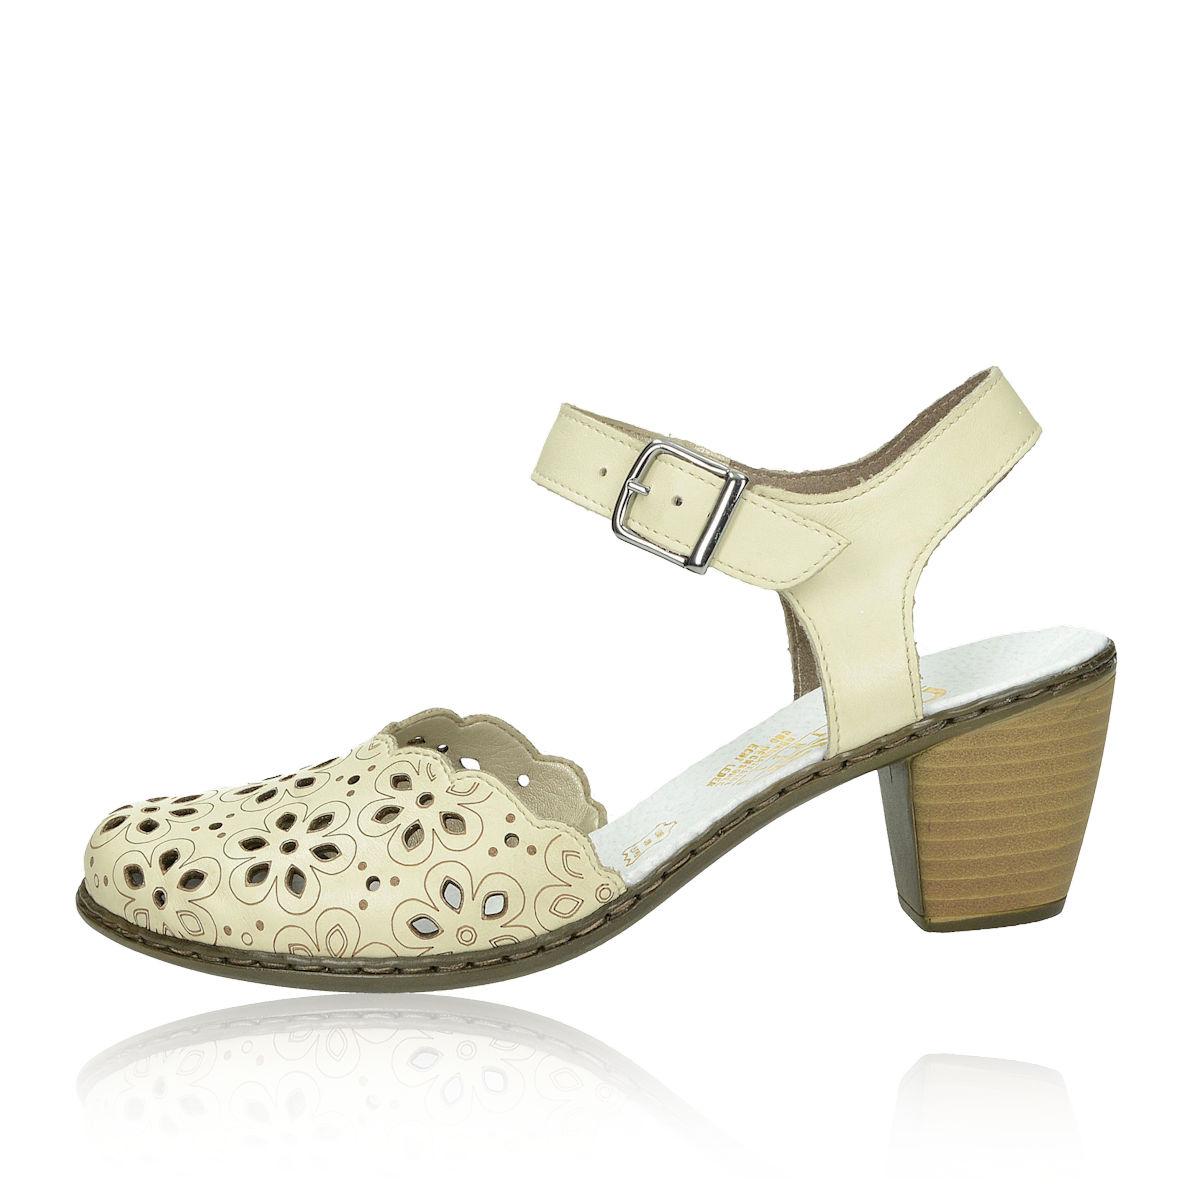 bd70215613f2 Rieker dámske sandále - béžové Rieker dámske sandále - béžové ...